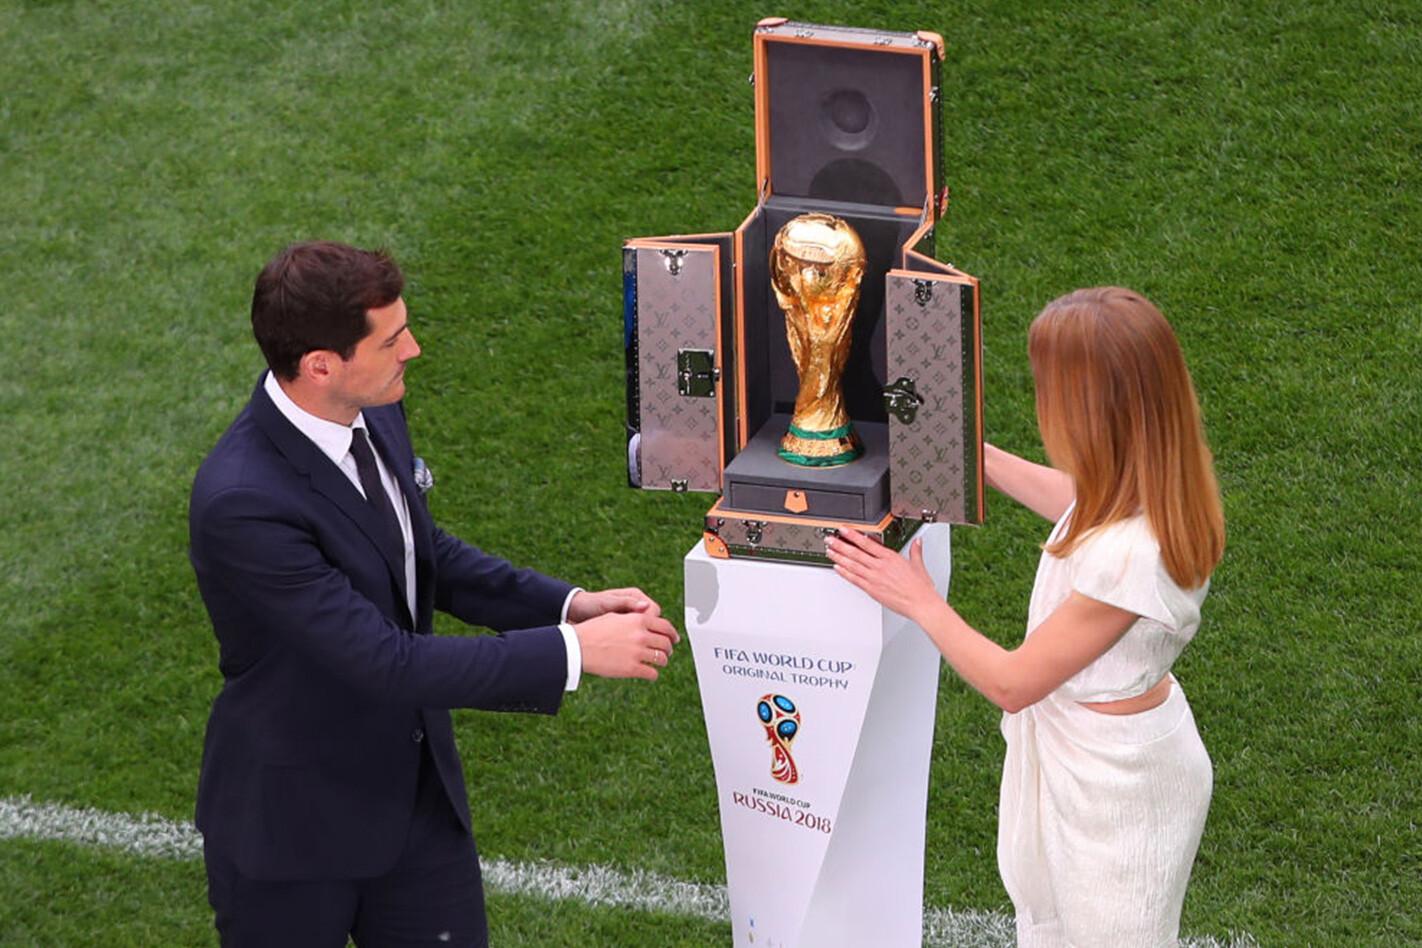 World Cup Jpg